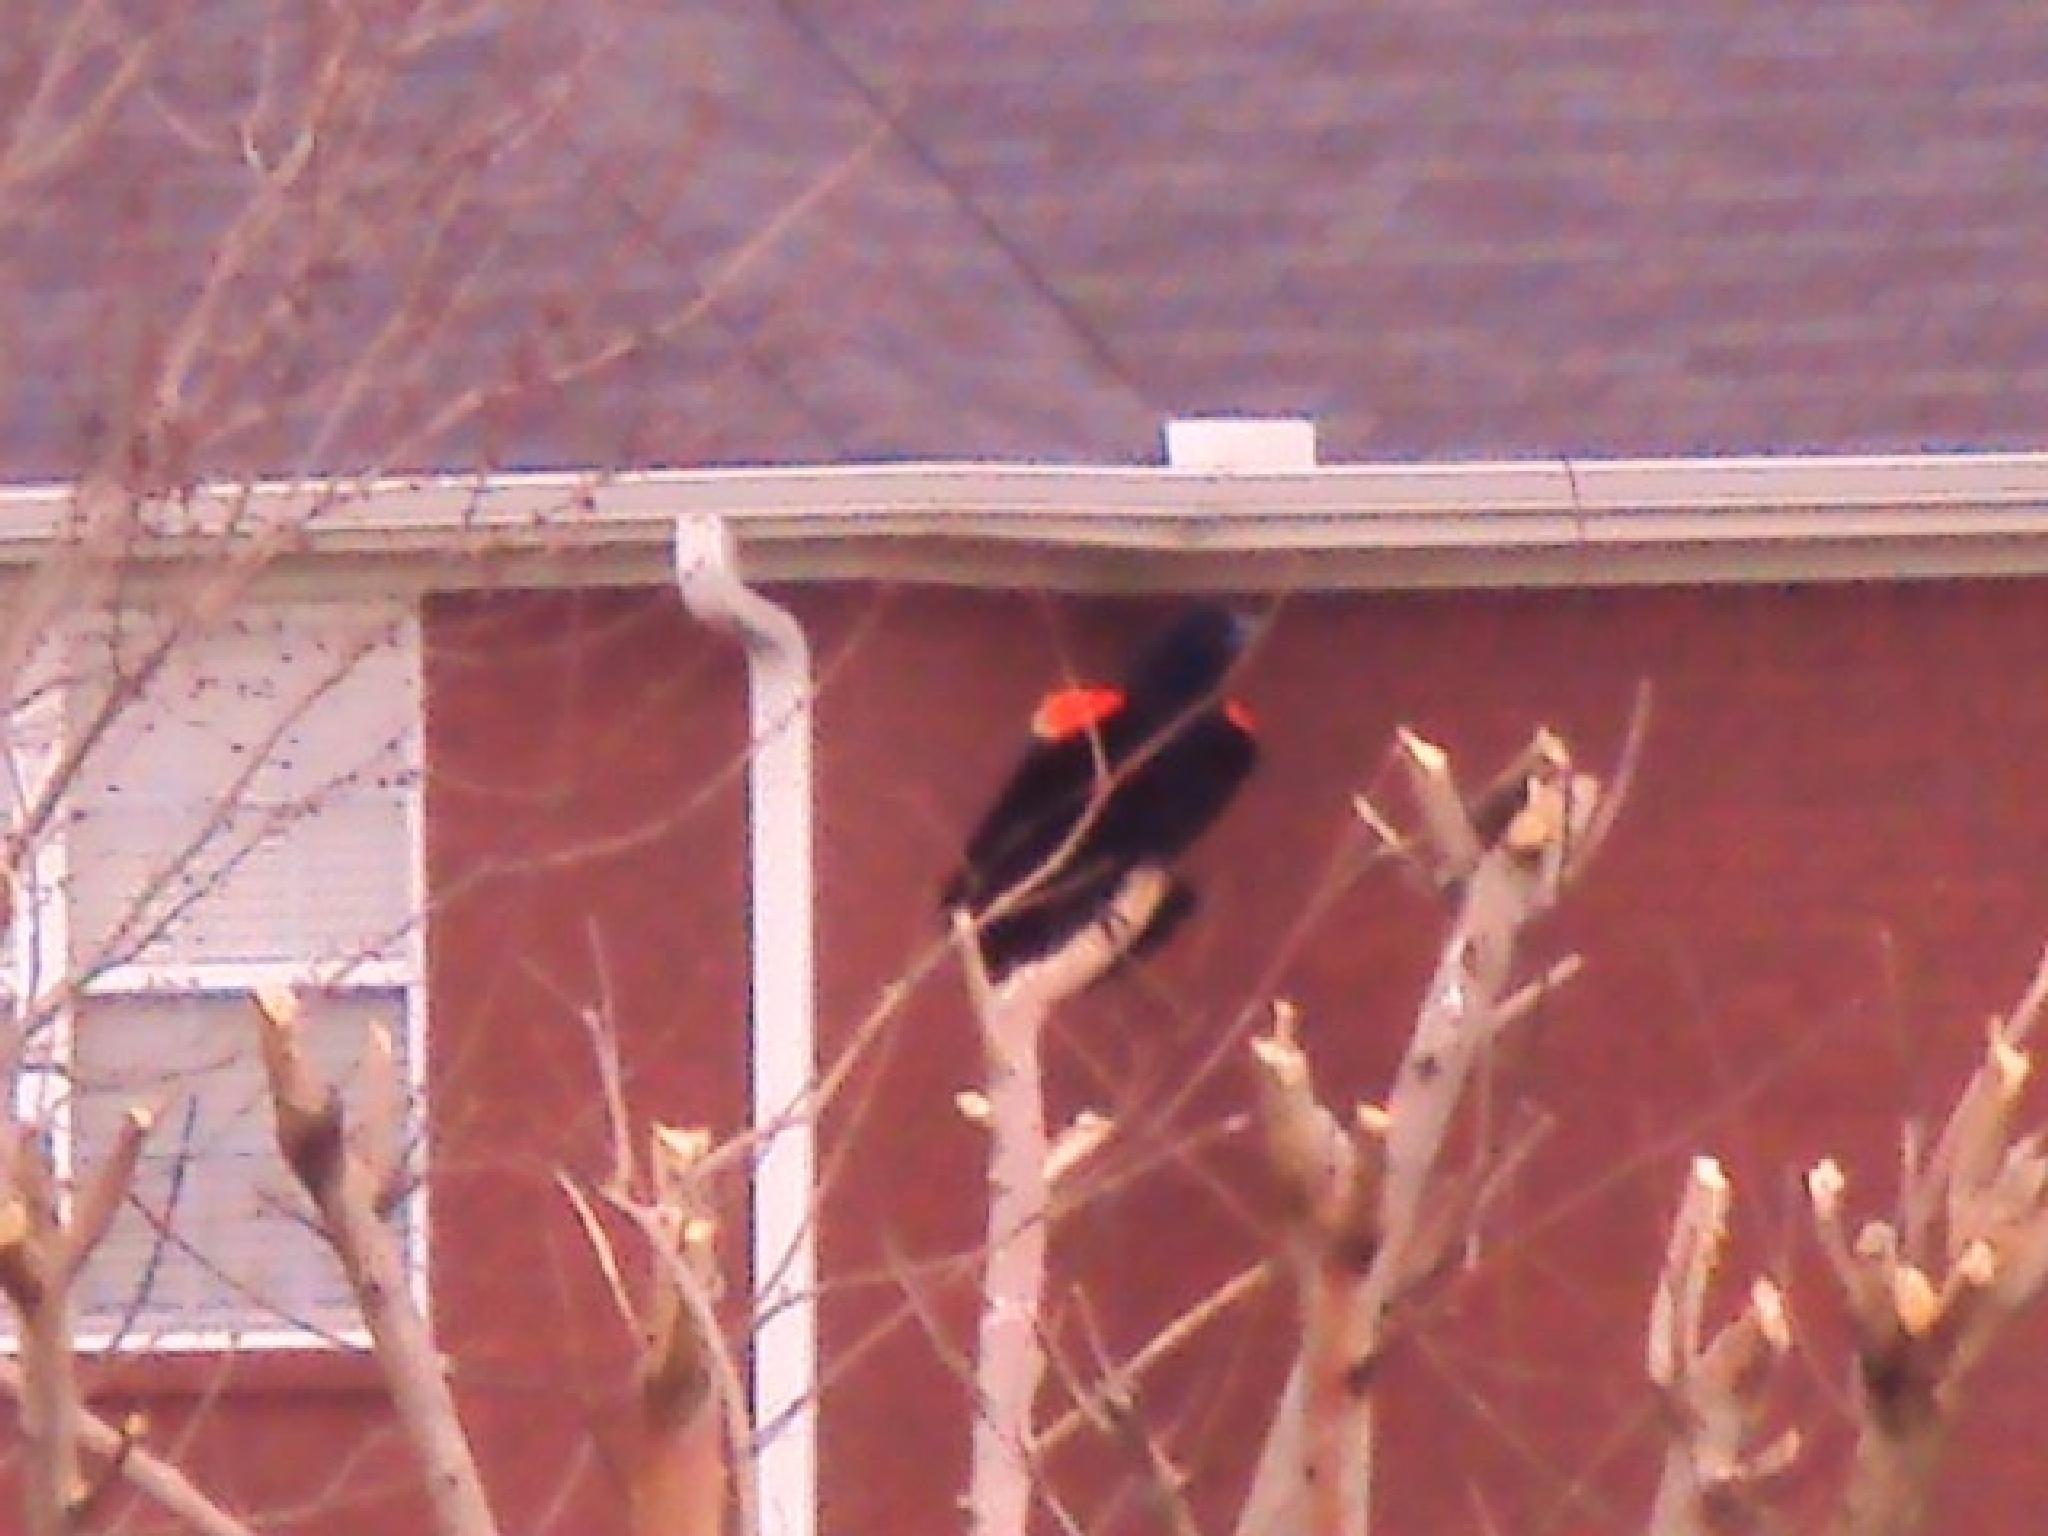 Red Wing Blackbird by Mahnaz & Yelda